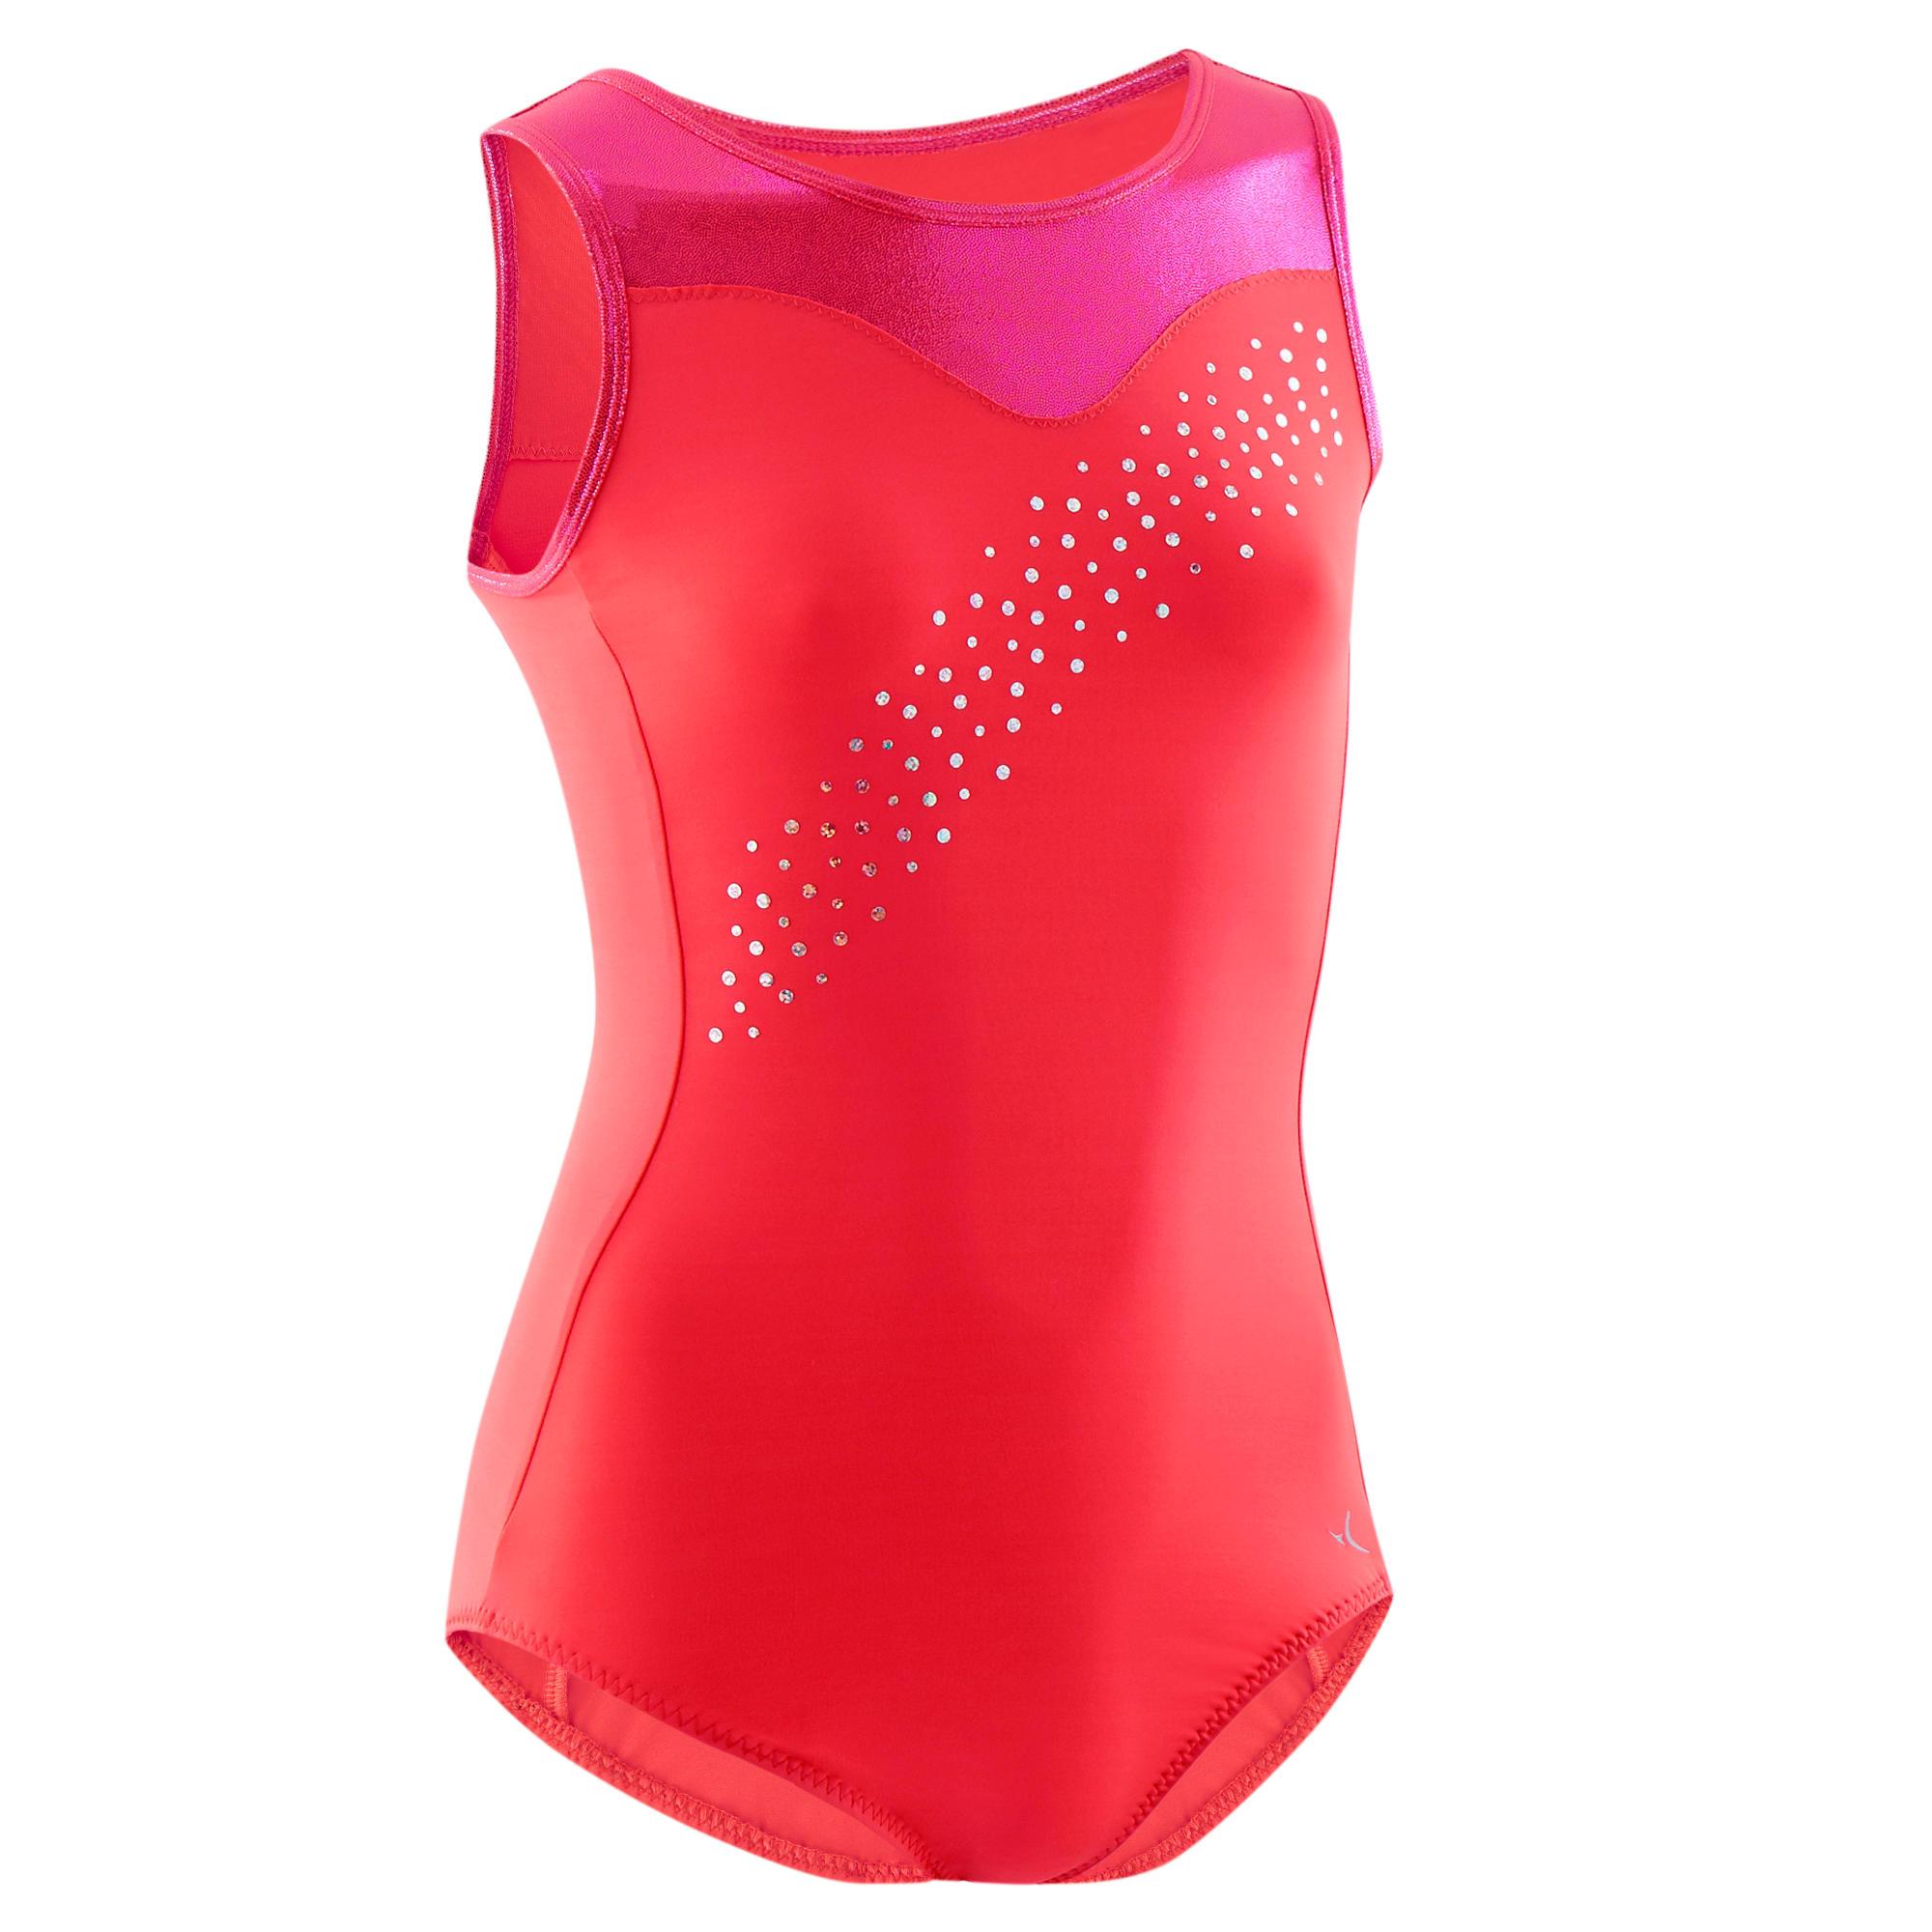 Body 540 gimnastică roz